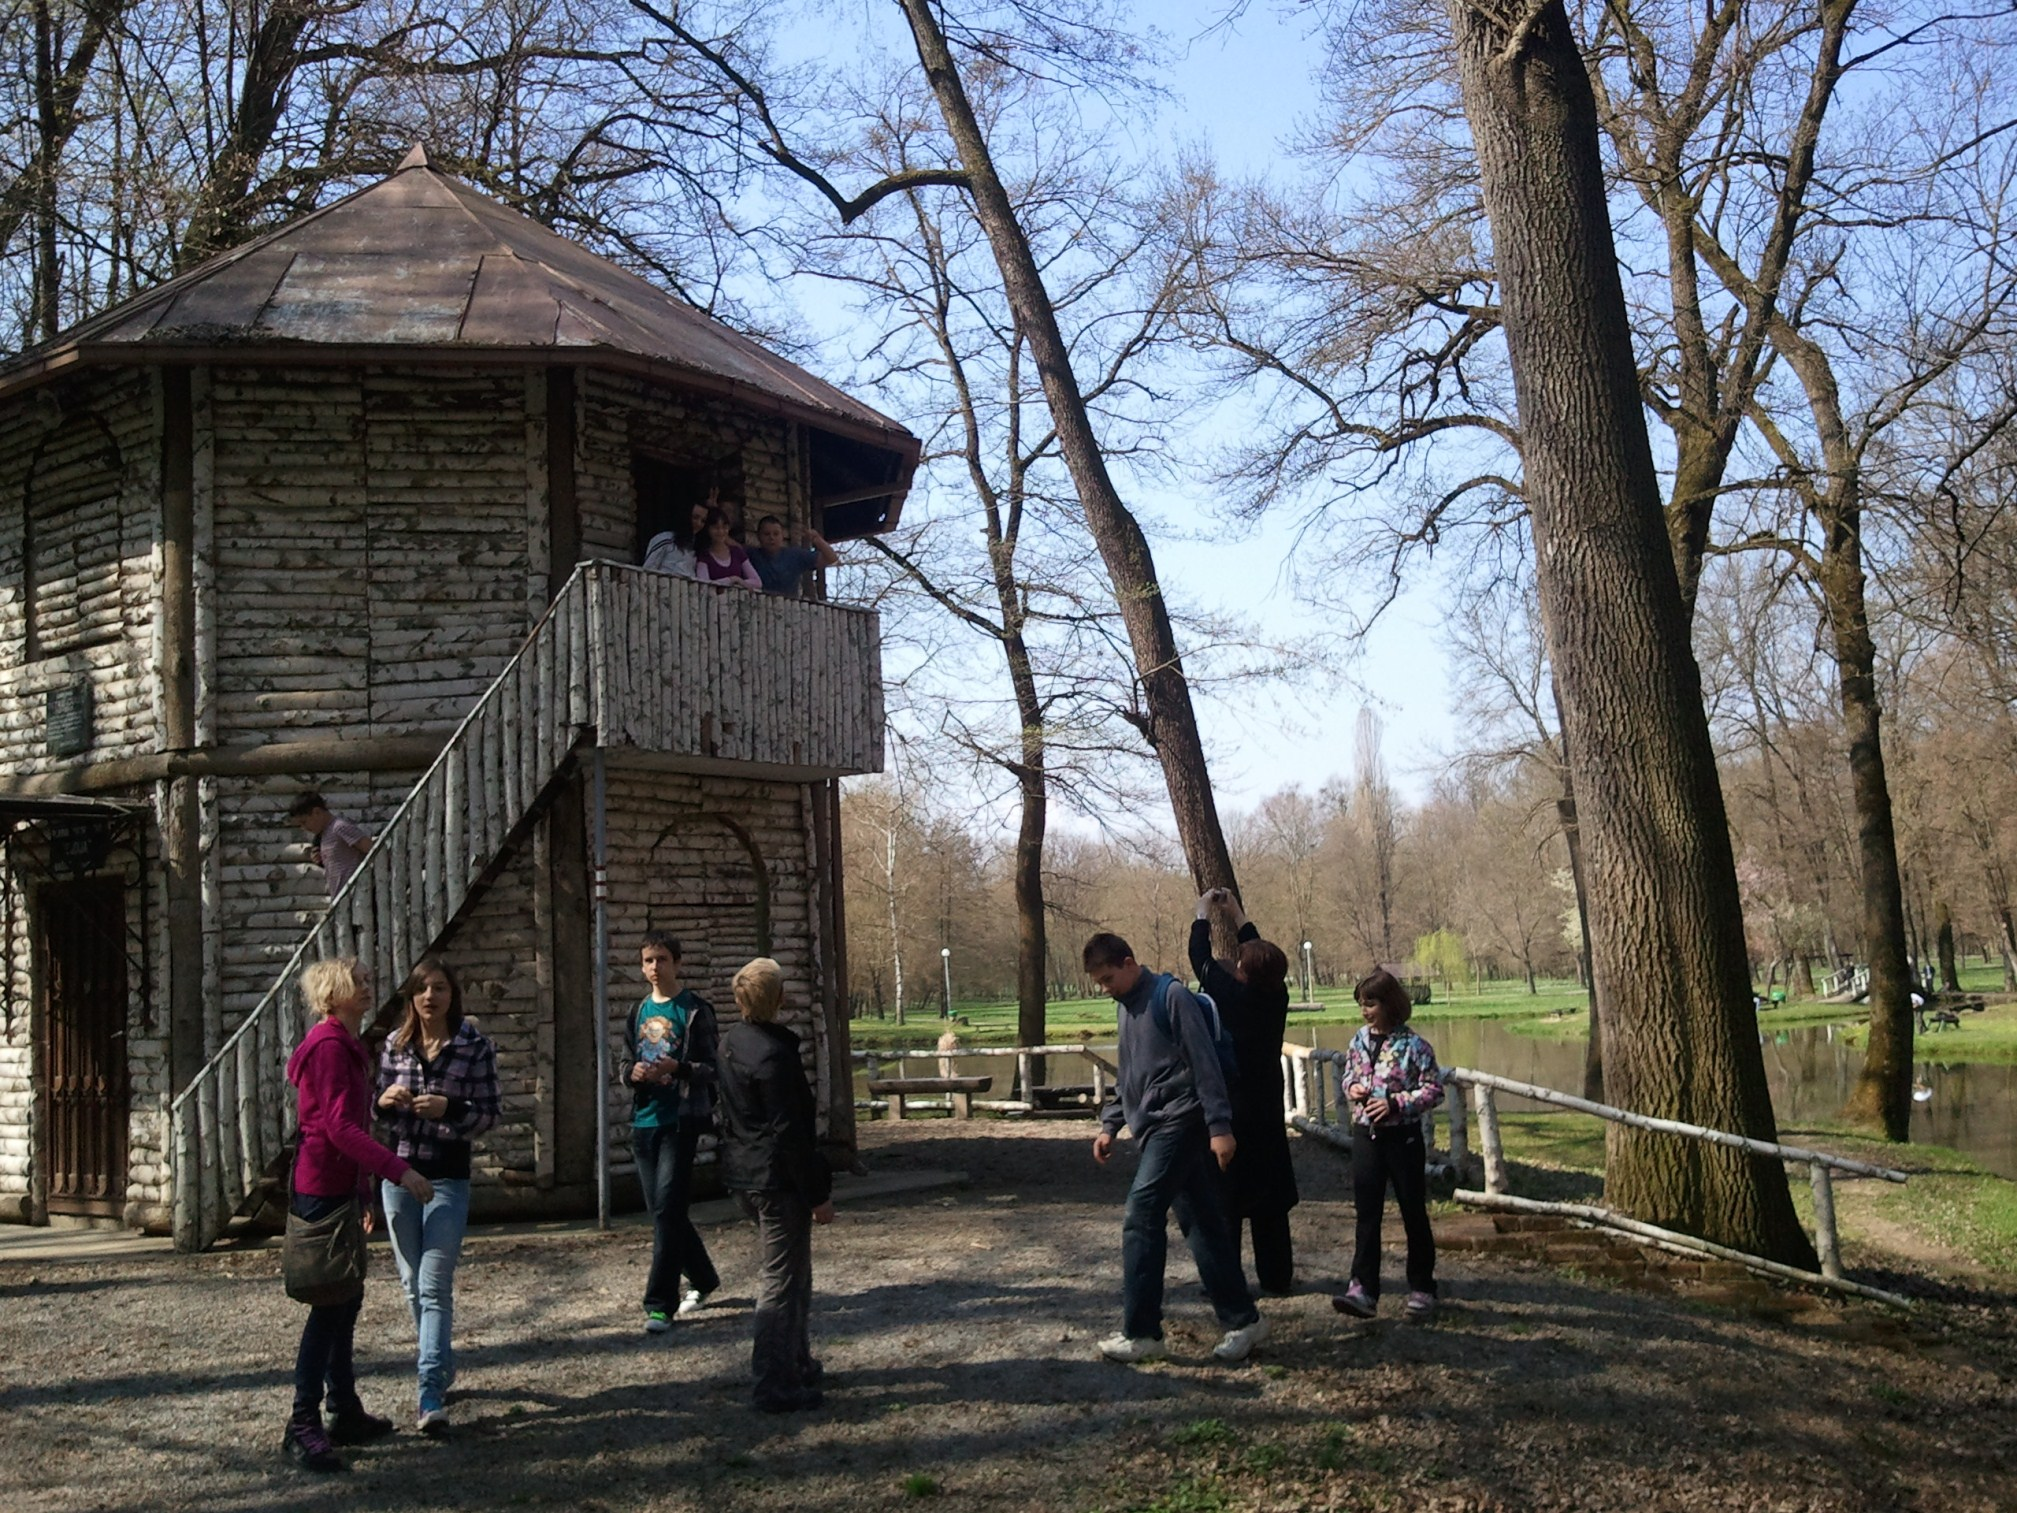 Slavonski plemići i najljepši dvorci Slavonije: Našice: Dorin paviljon